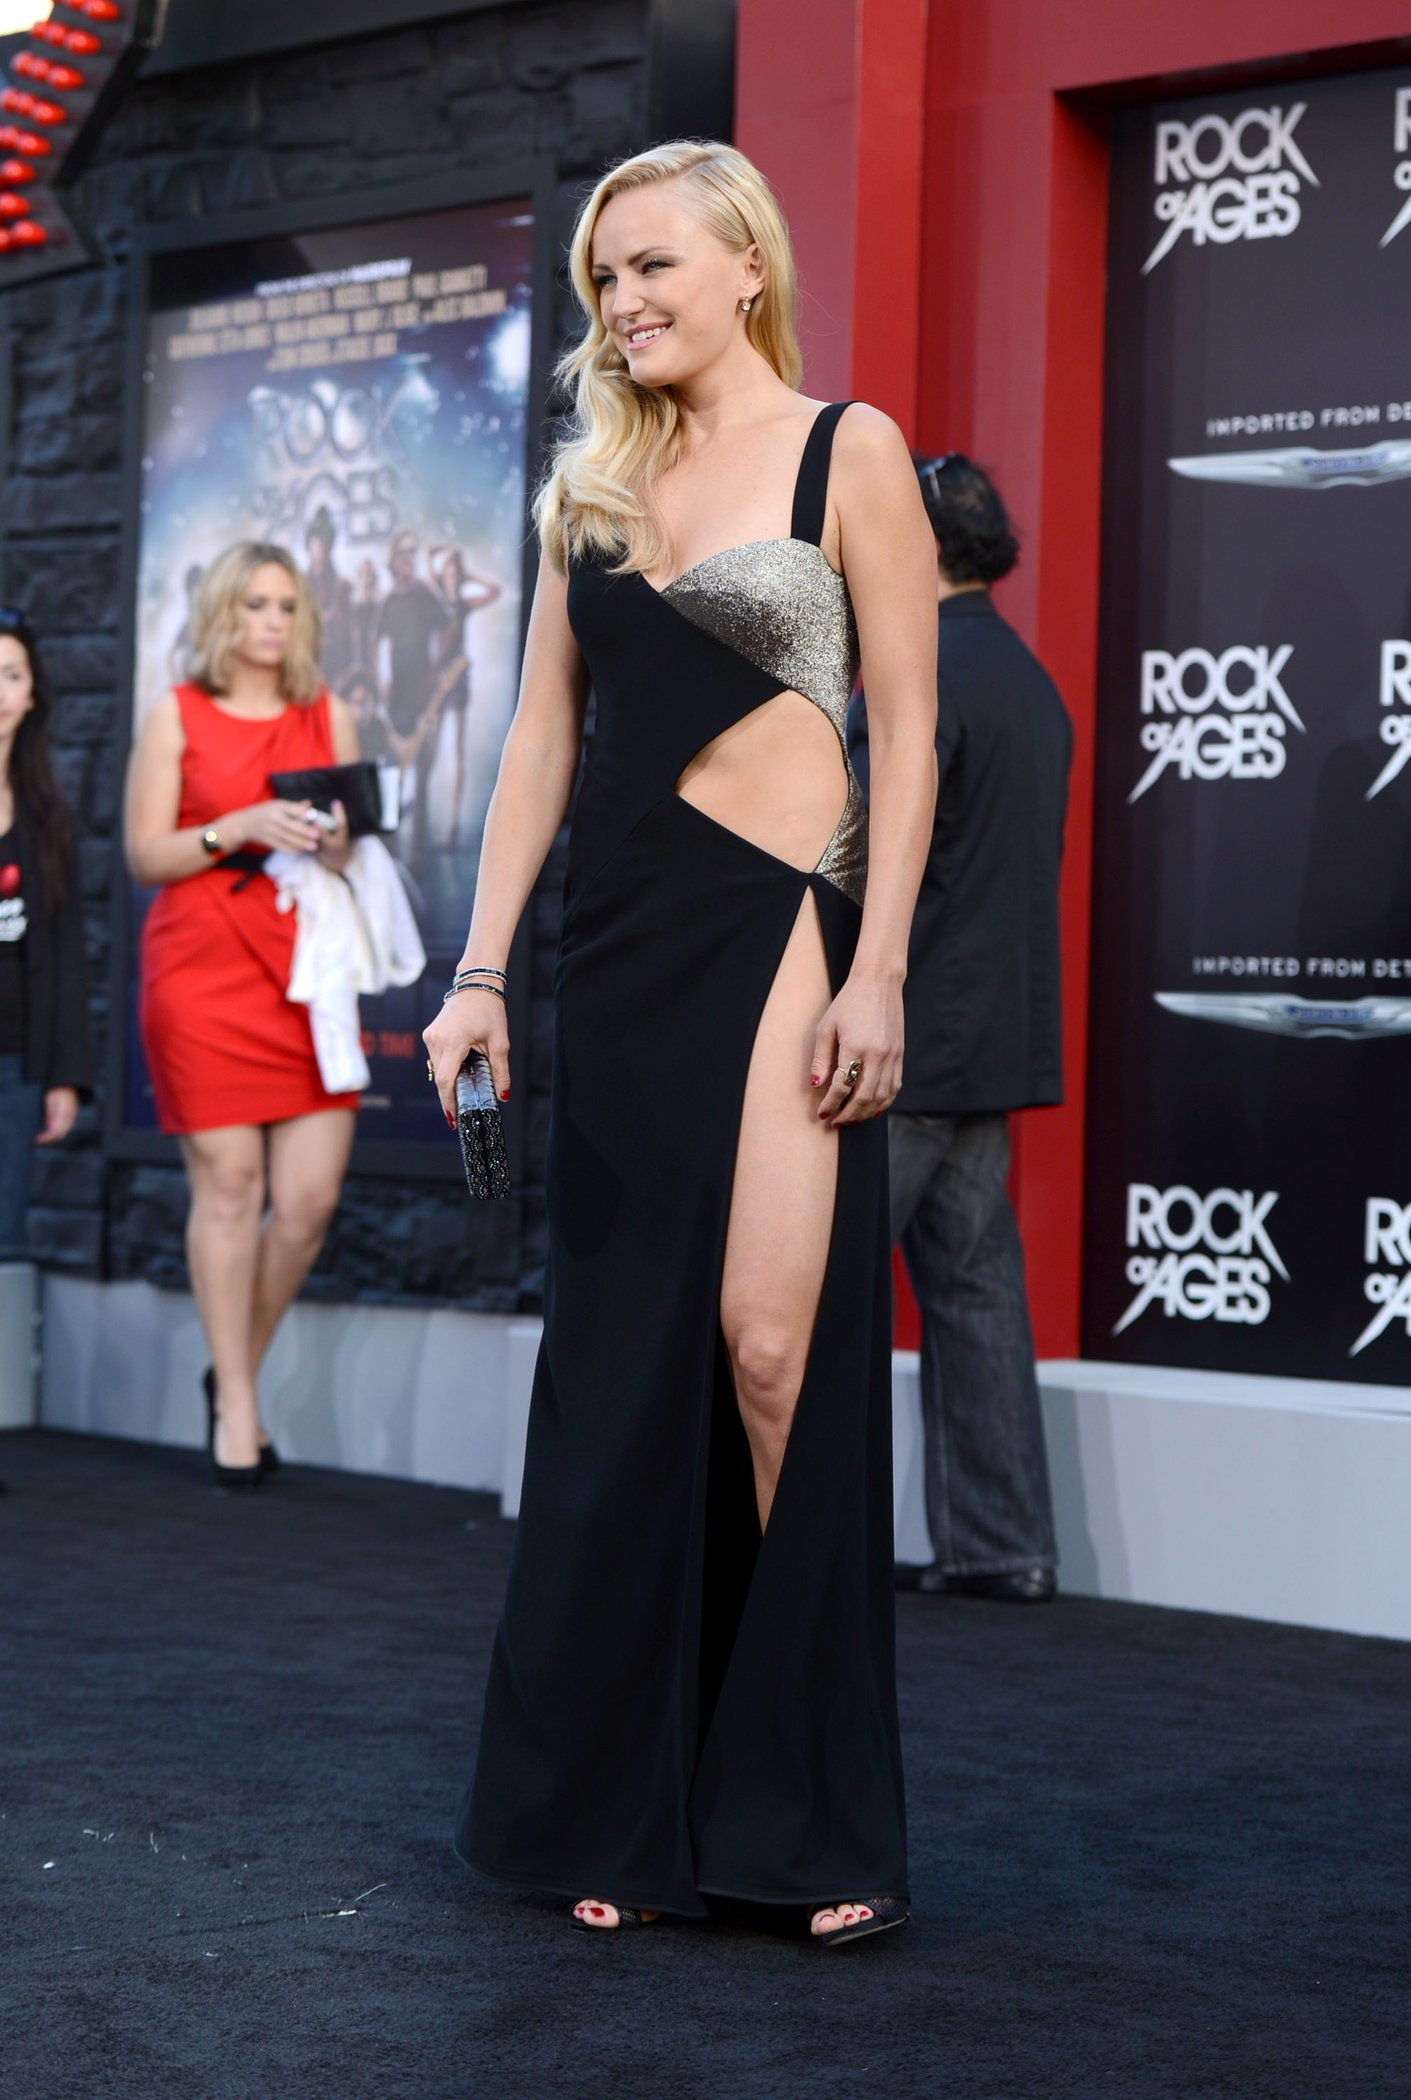 Malin Akerman -  Rock Of Ages  Premiere in Los Angeles (June 8, 2012)